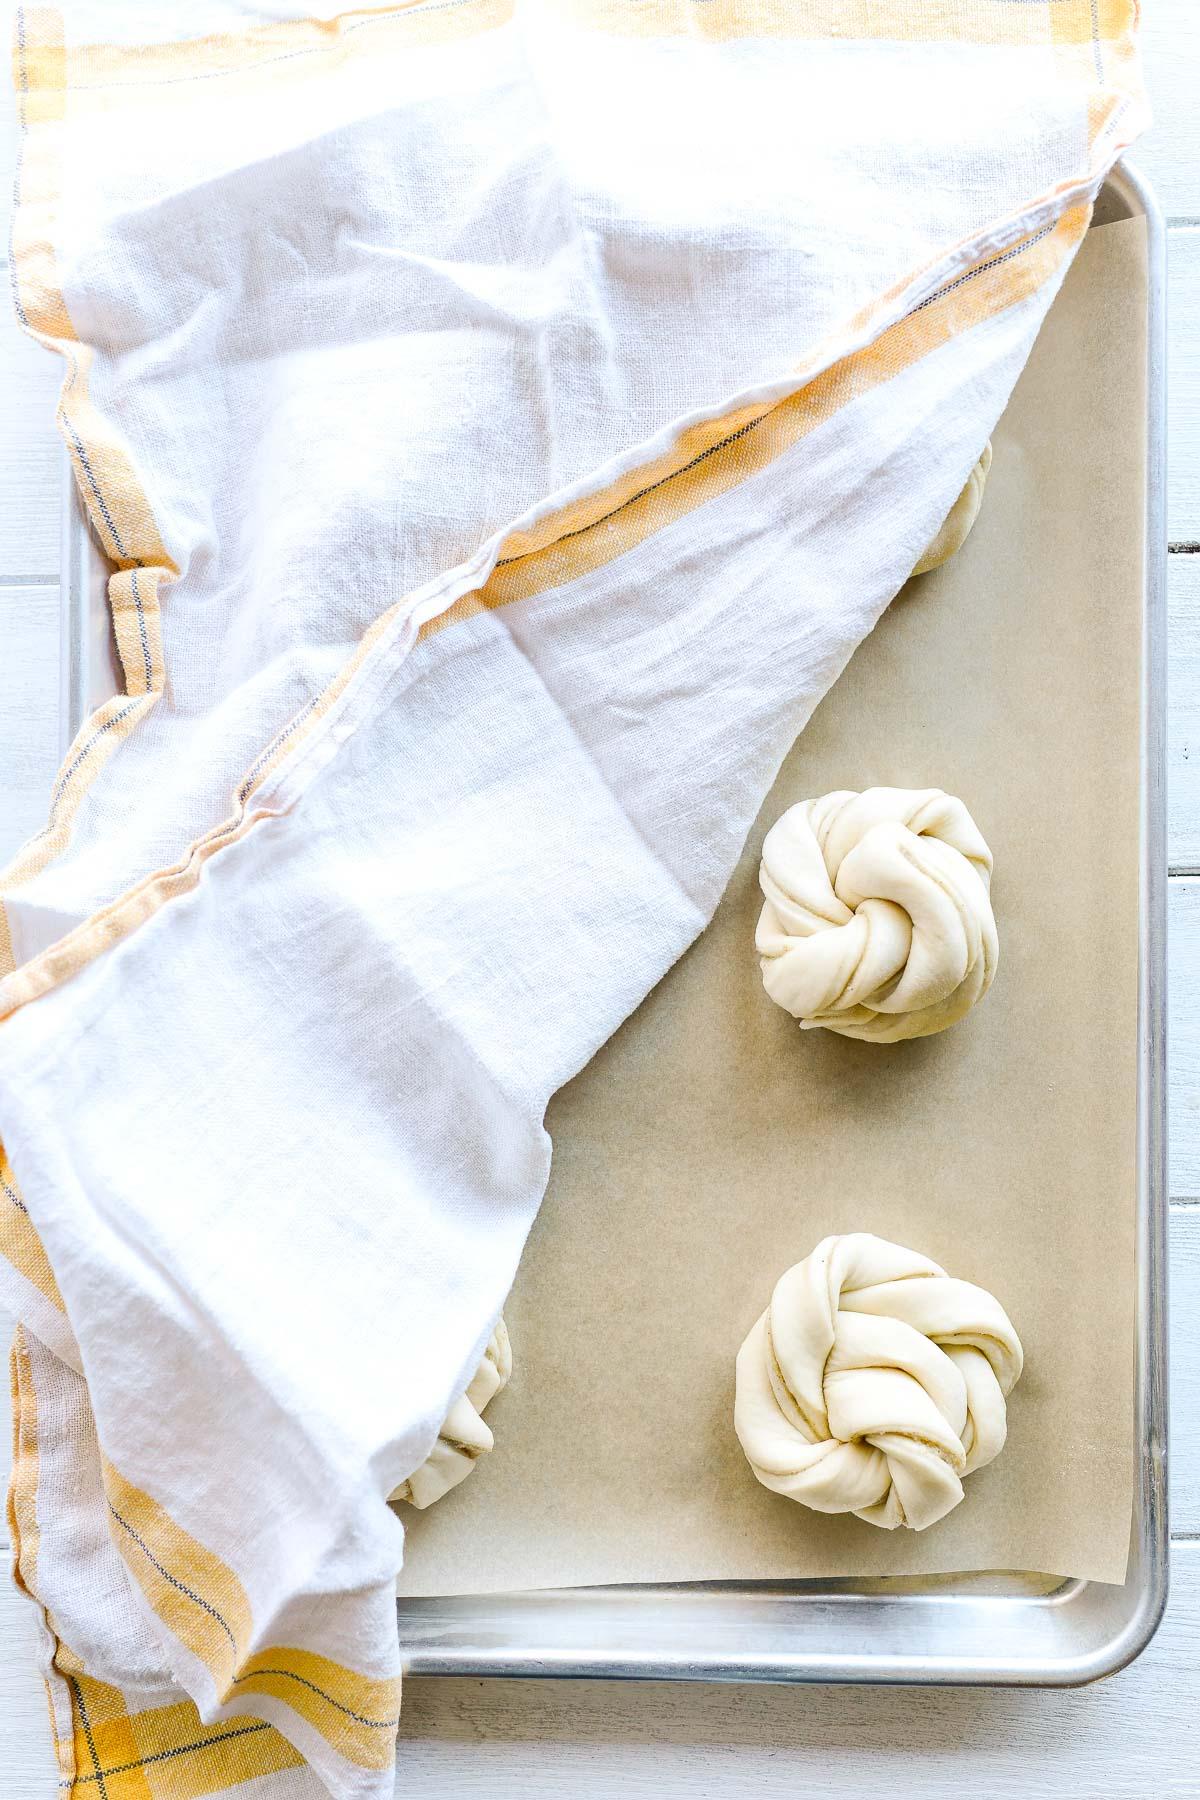 cardamom buns resting on a baking sheet